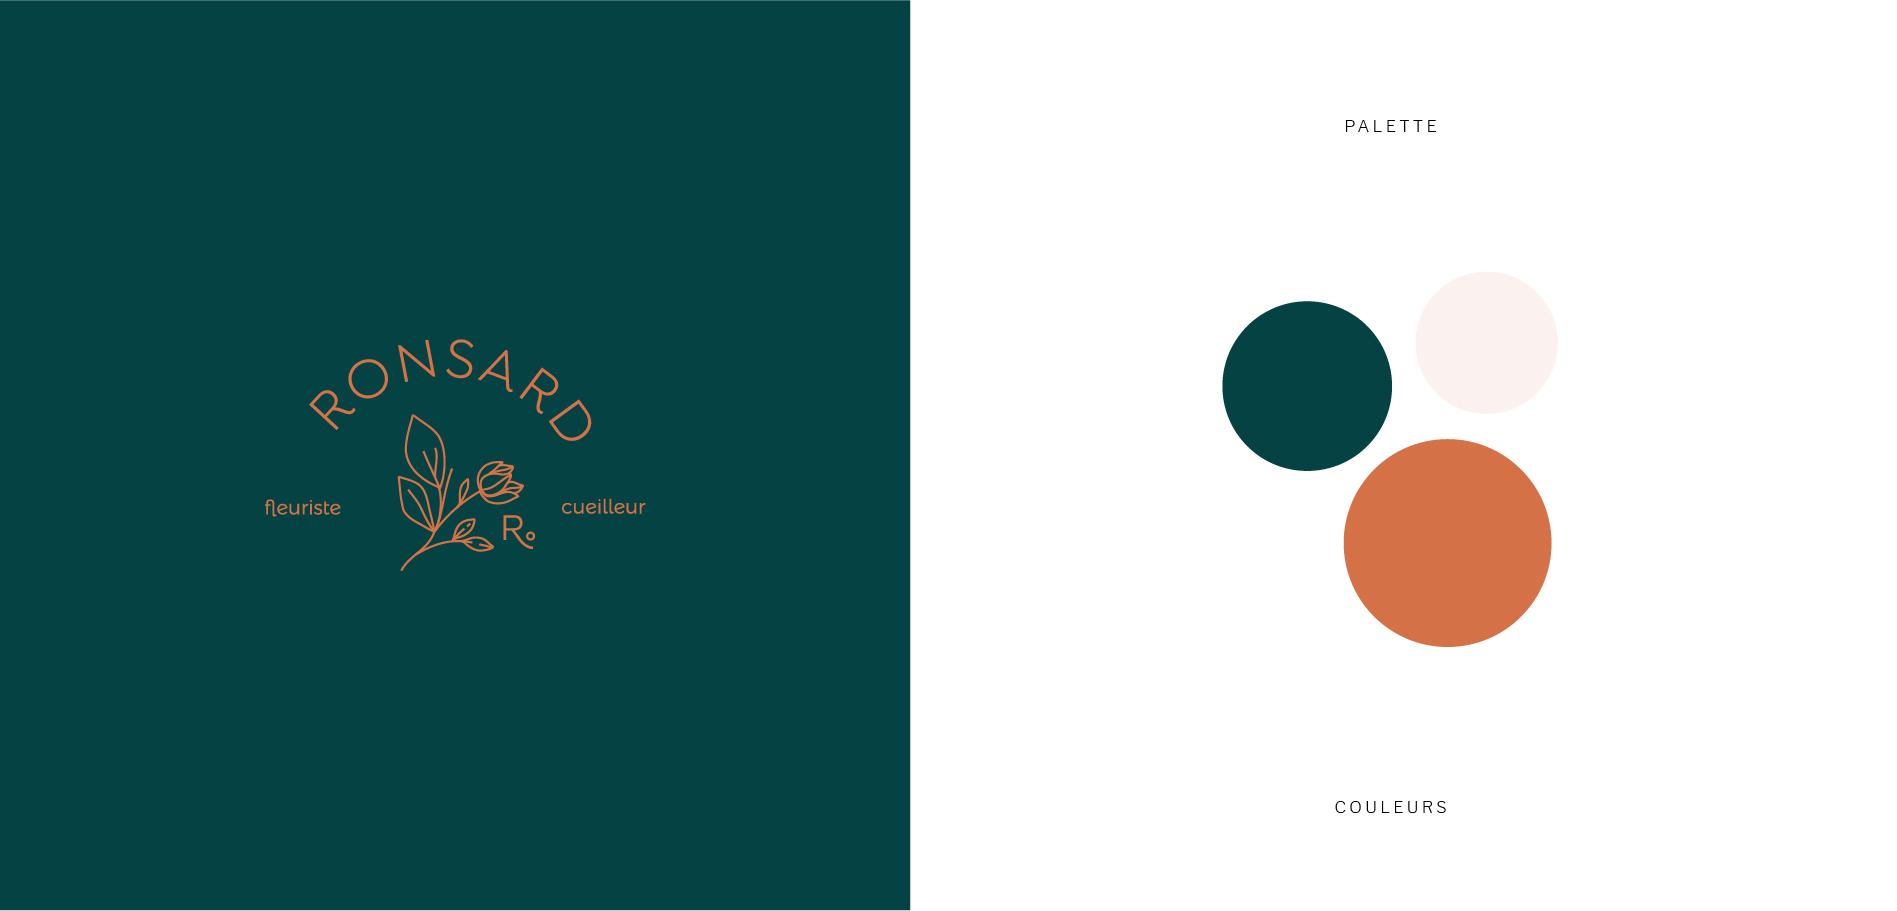 mariebabeau-graphiste-strasbourg-creation-logo-charte-graphique-alsace-ronsard-fleuriste1@2x-100